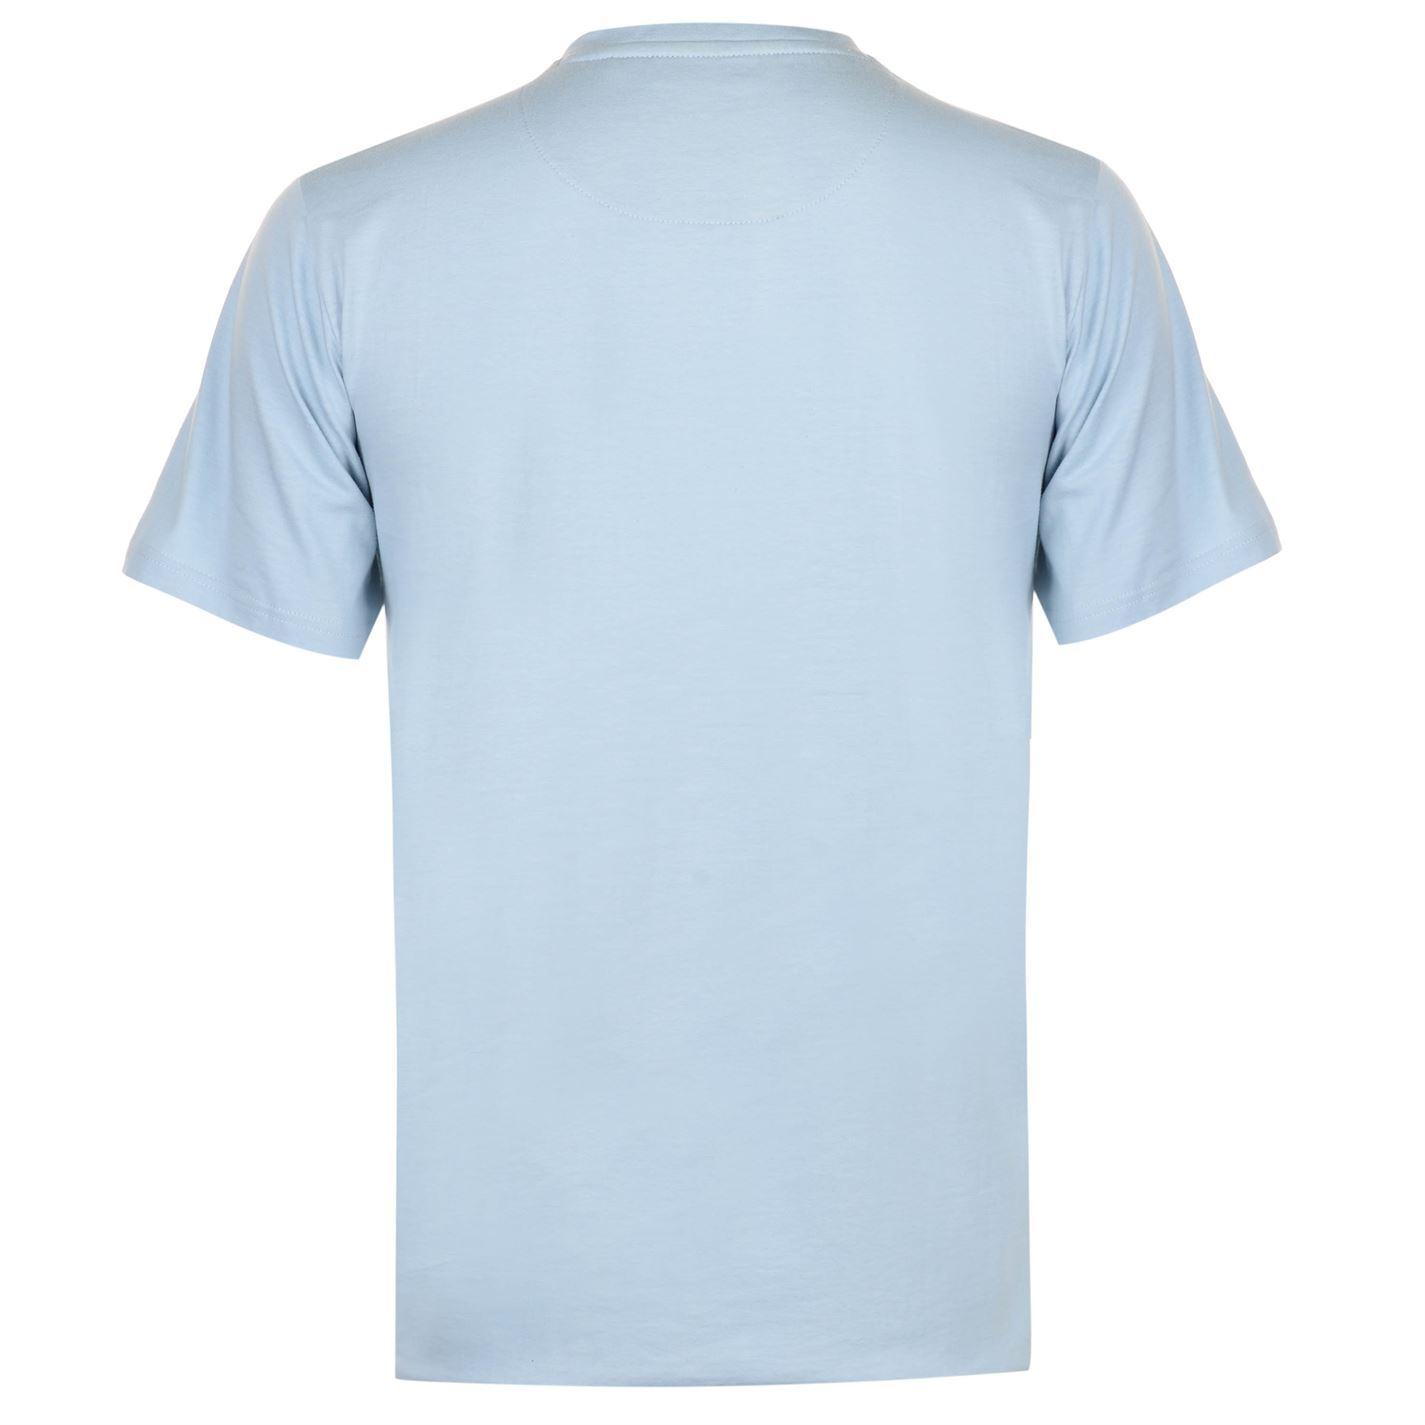 05b21faf Pierre Cardin Contrast Henley T-Shirt Mens Blue Tee Shirt Tshirt Top ...